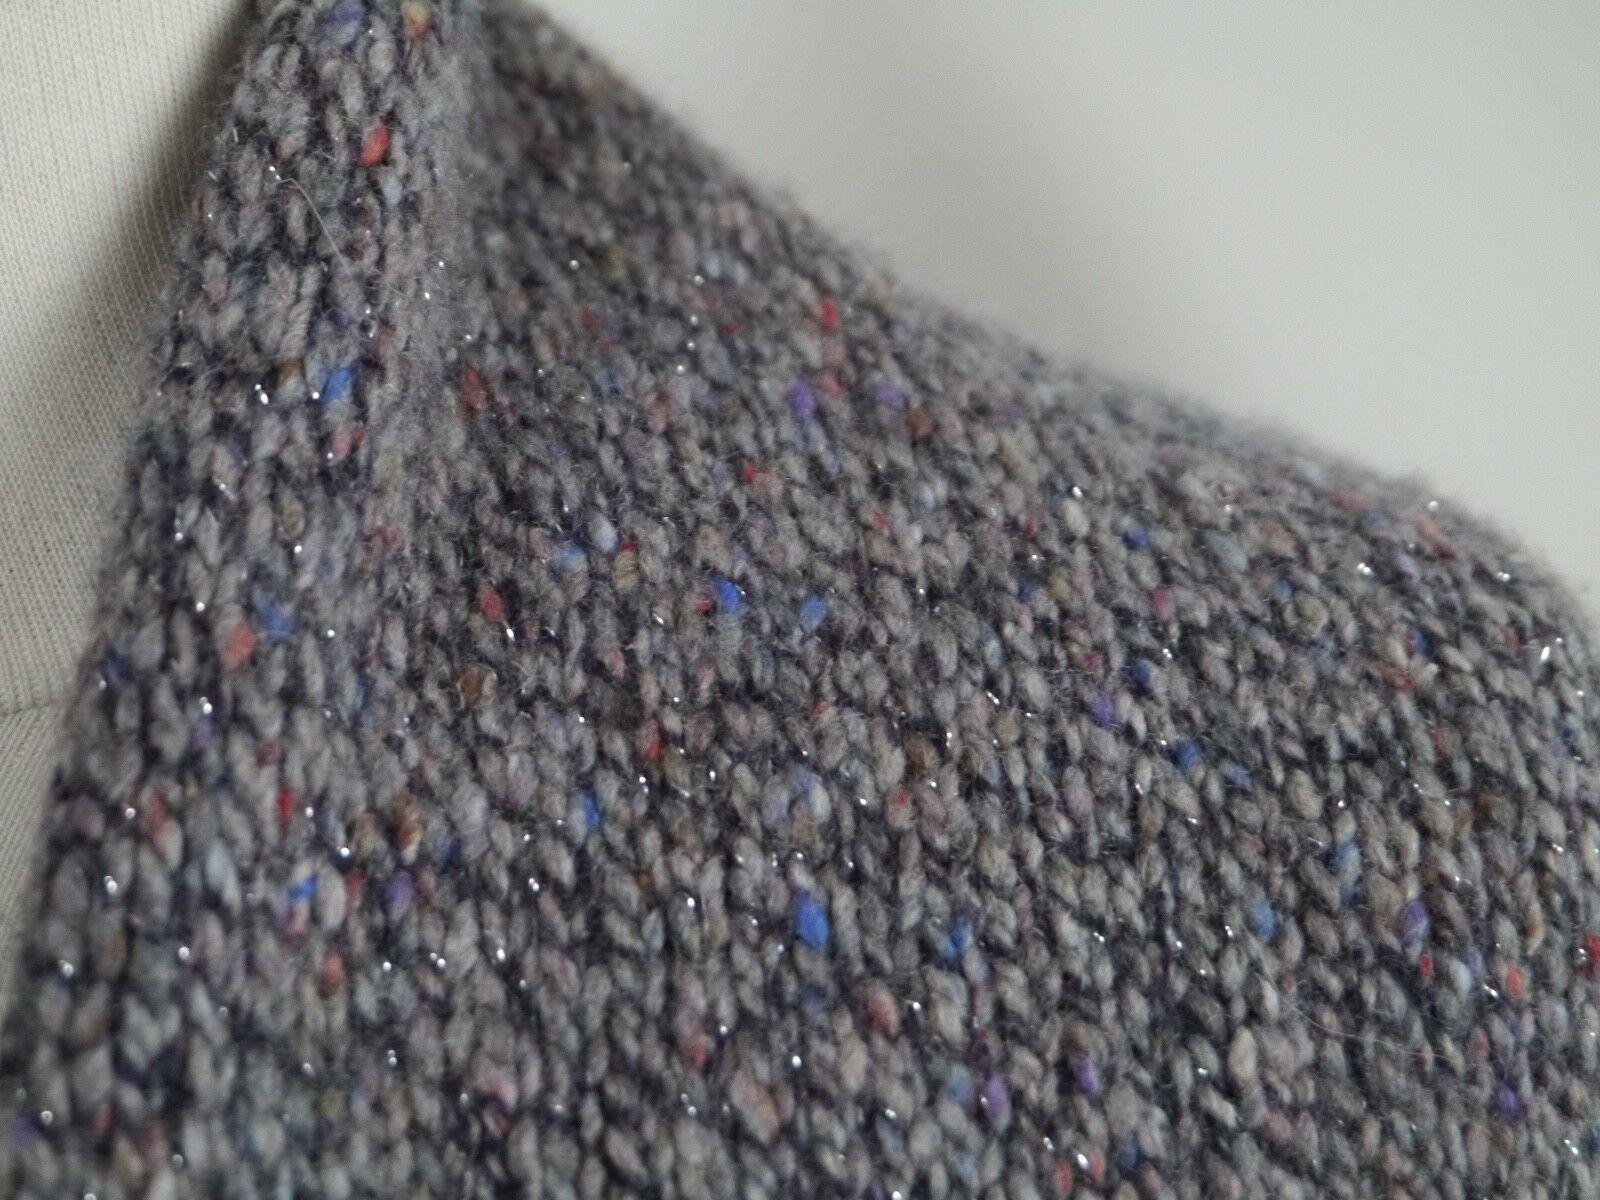 BRUNELLO BRUNELLO BRUNELLO CUCINELLI marled cashmere blend cardigan shrug sweater size L WORN ONCE 31314e